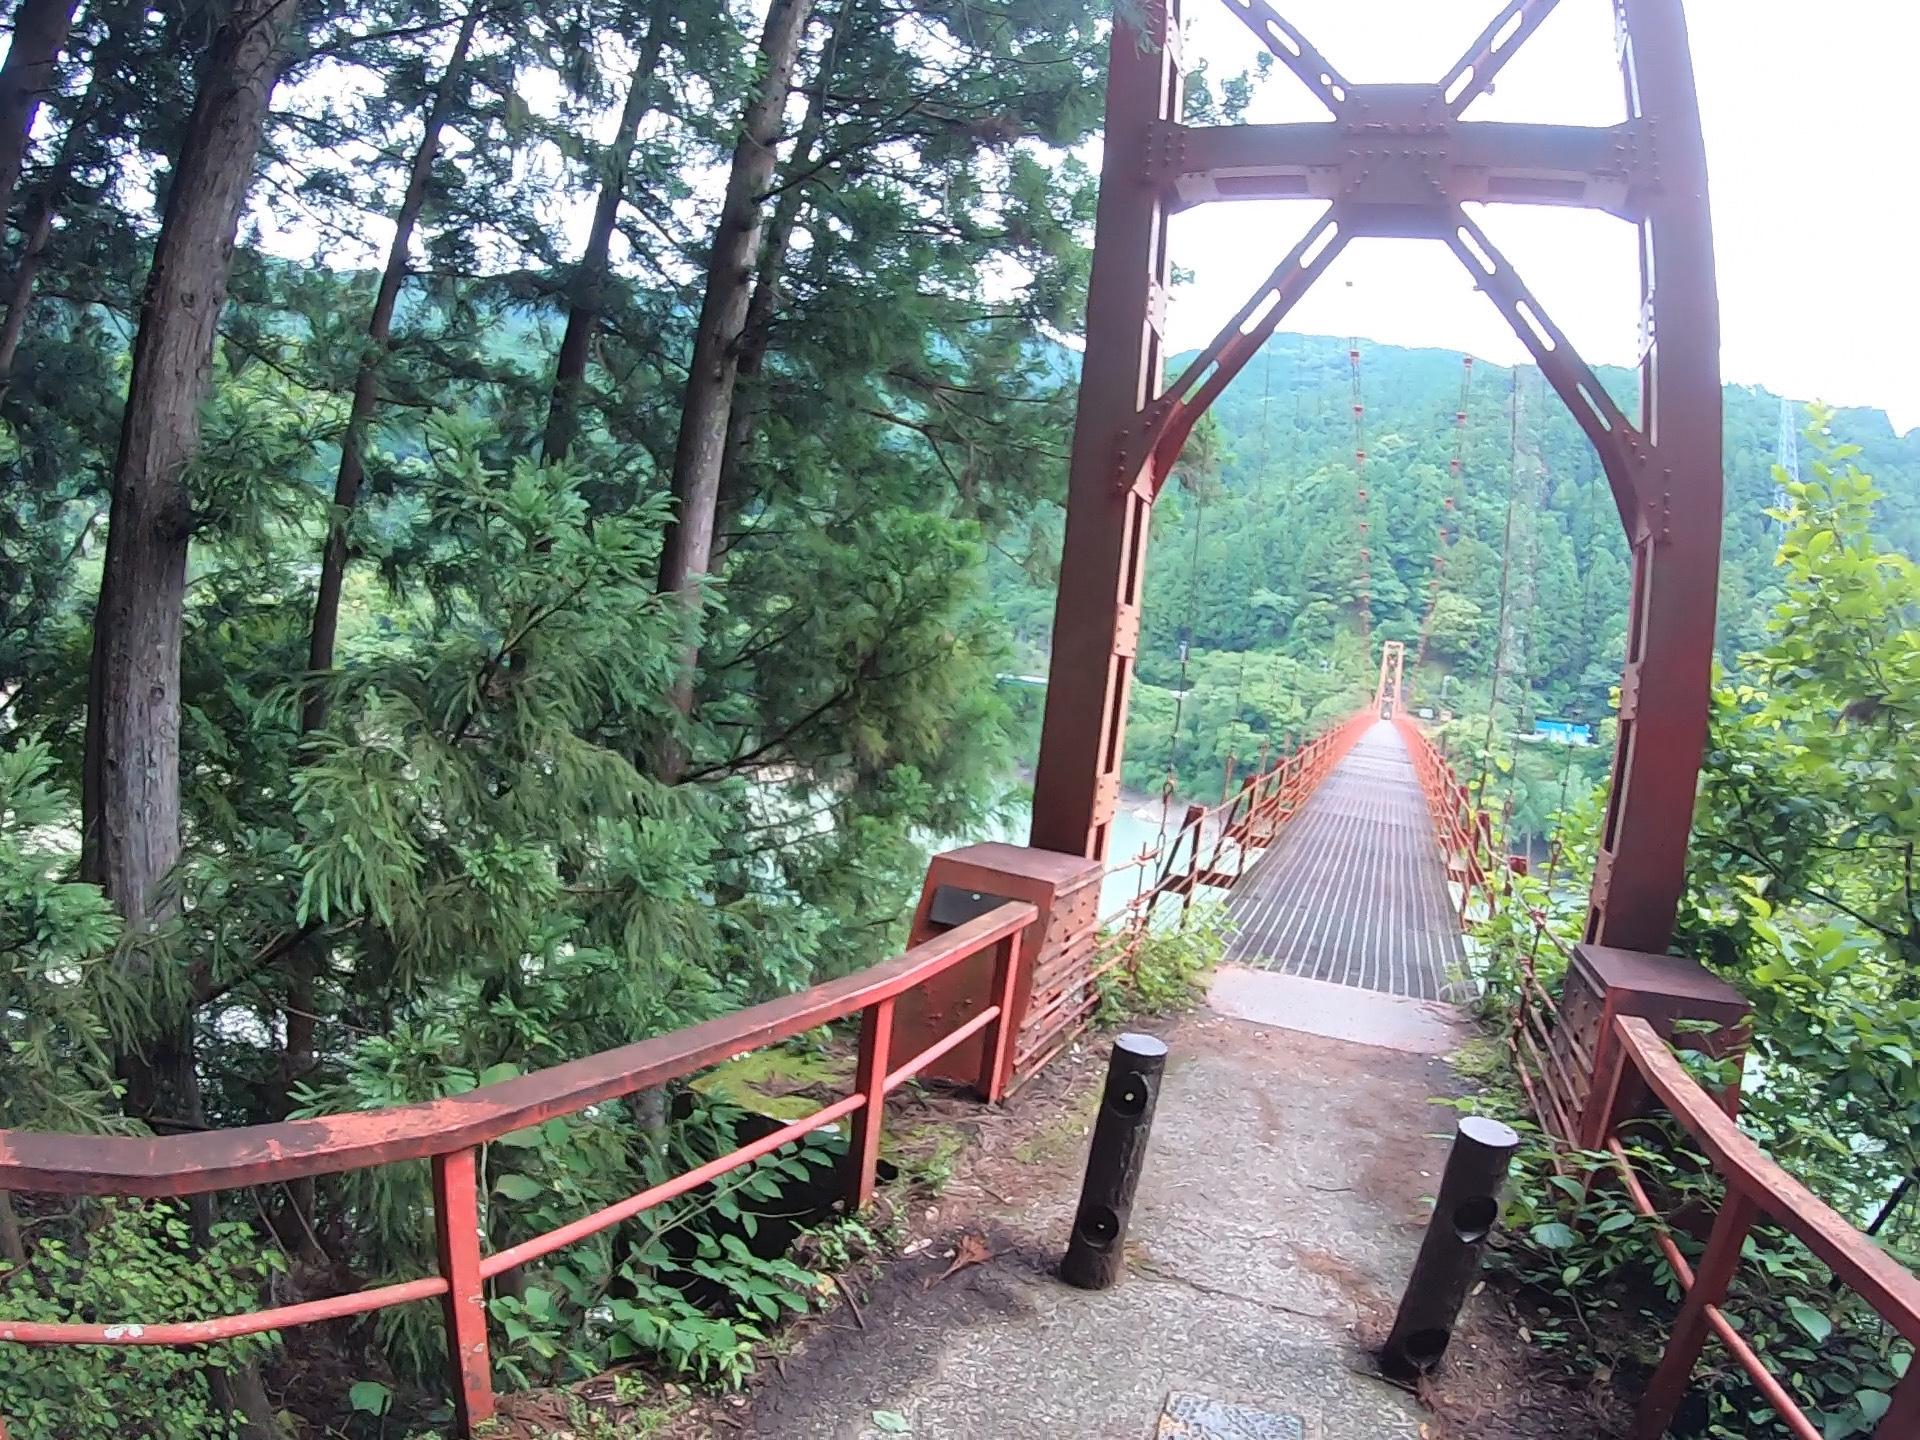 harleydavidson-motorcycle-touring-blog-wakayama-arita-zaoubashi-bridge-suspensionbridge.jpg